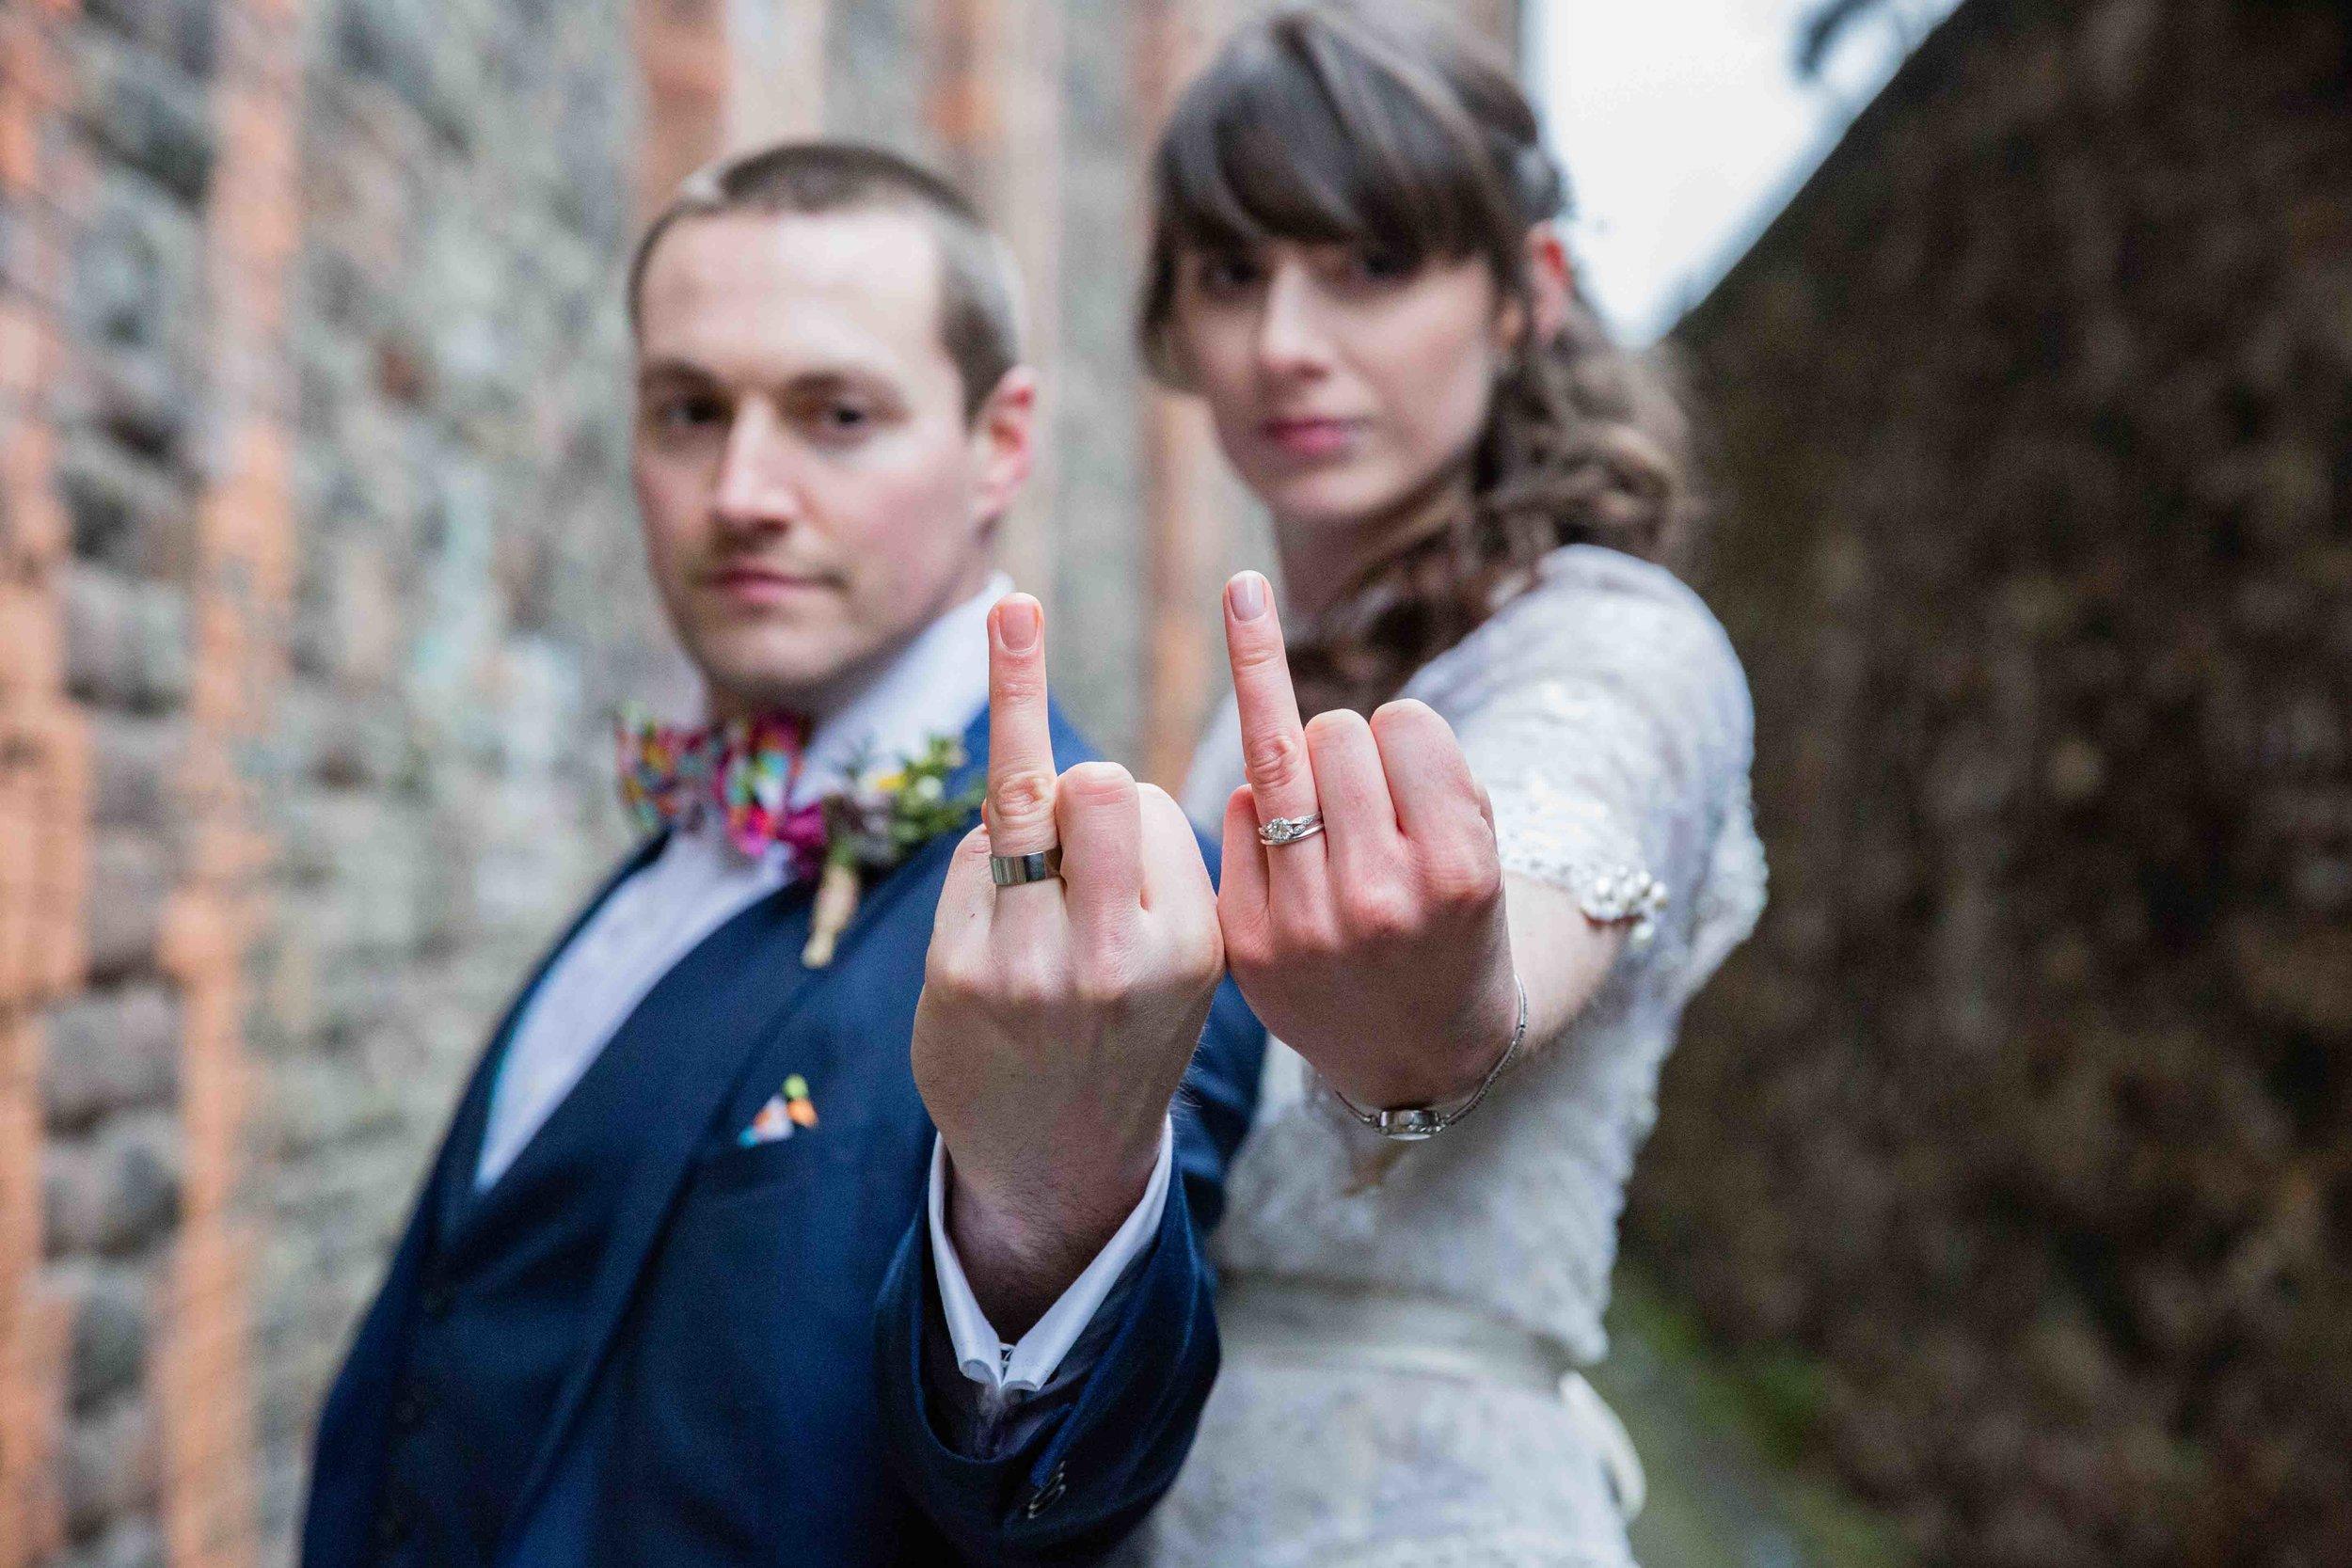 Adam & Faye - Wright Wedding Photography - Bristol Wedding Photographer -308.jpg